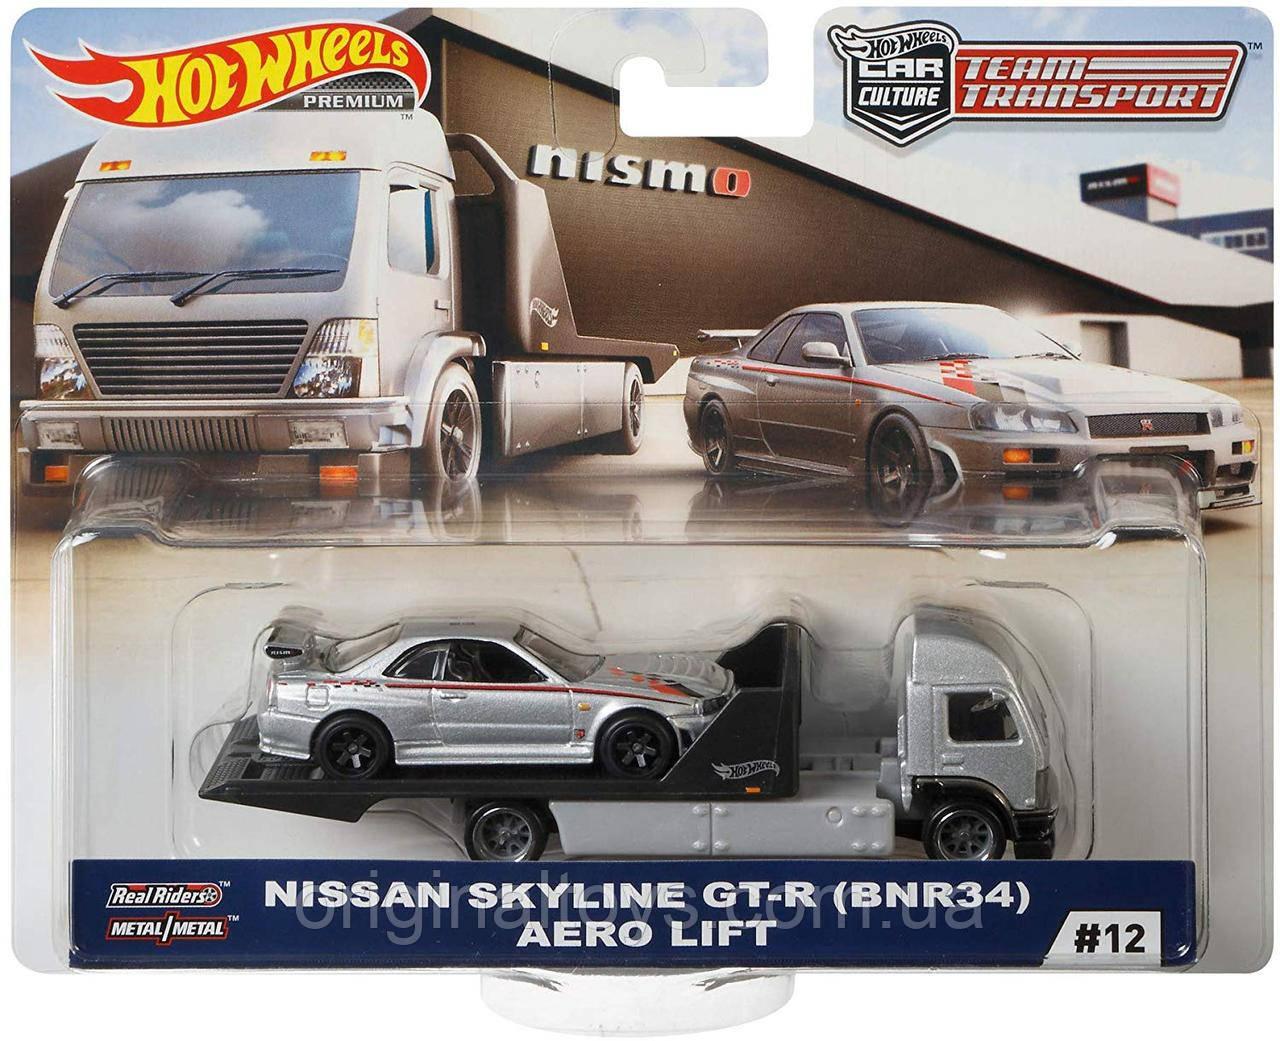 Колекційні моделі Hot Wheels Nissan Skyline GT-R ( BNR34) aero lift